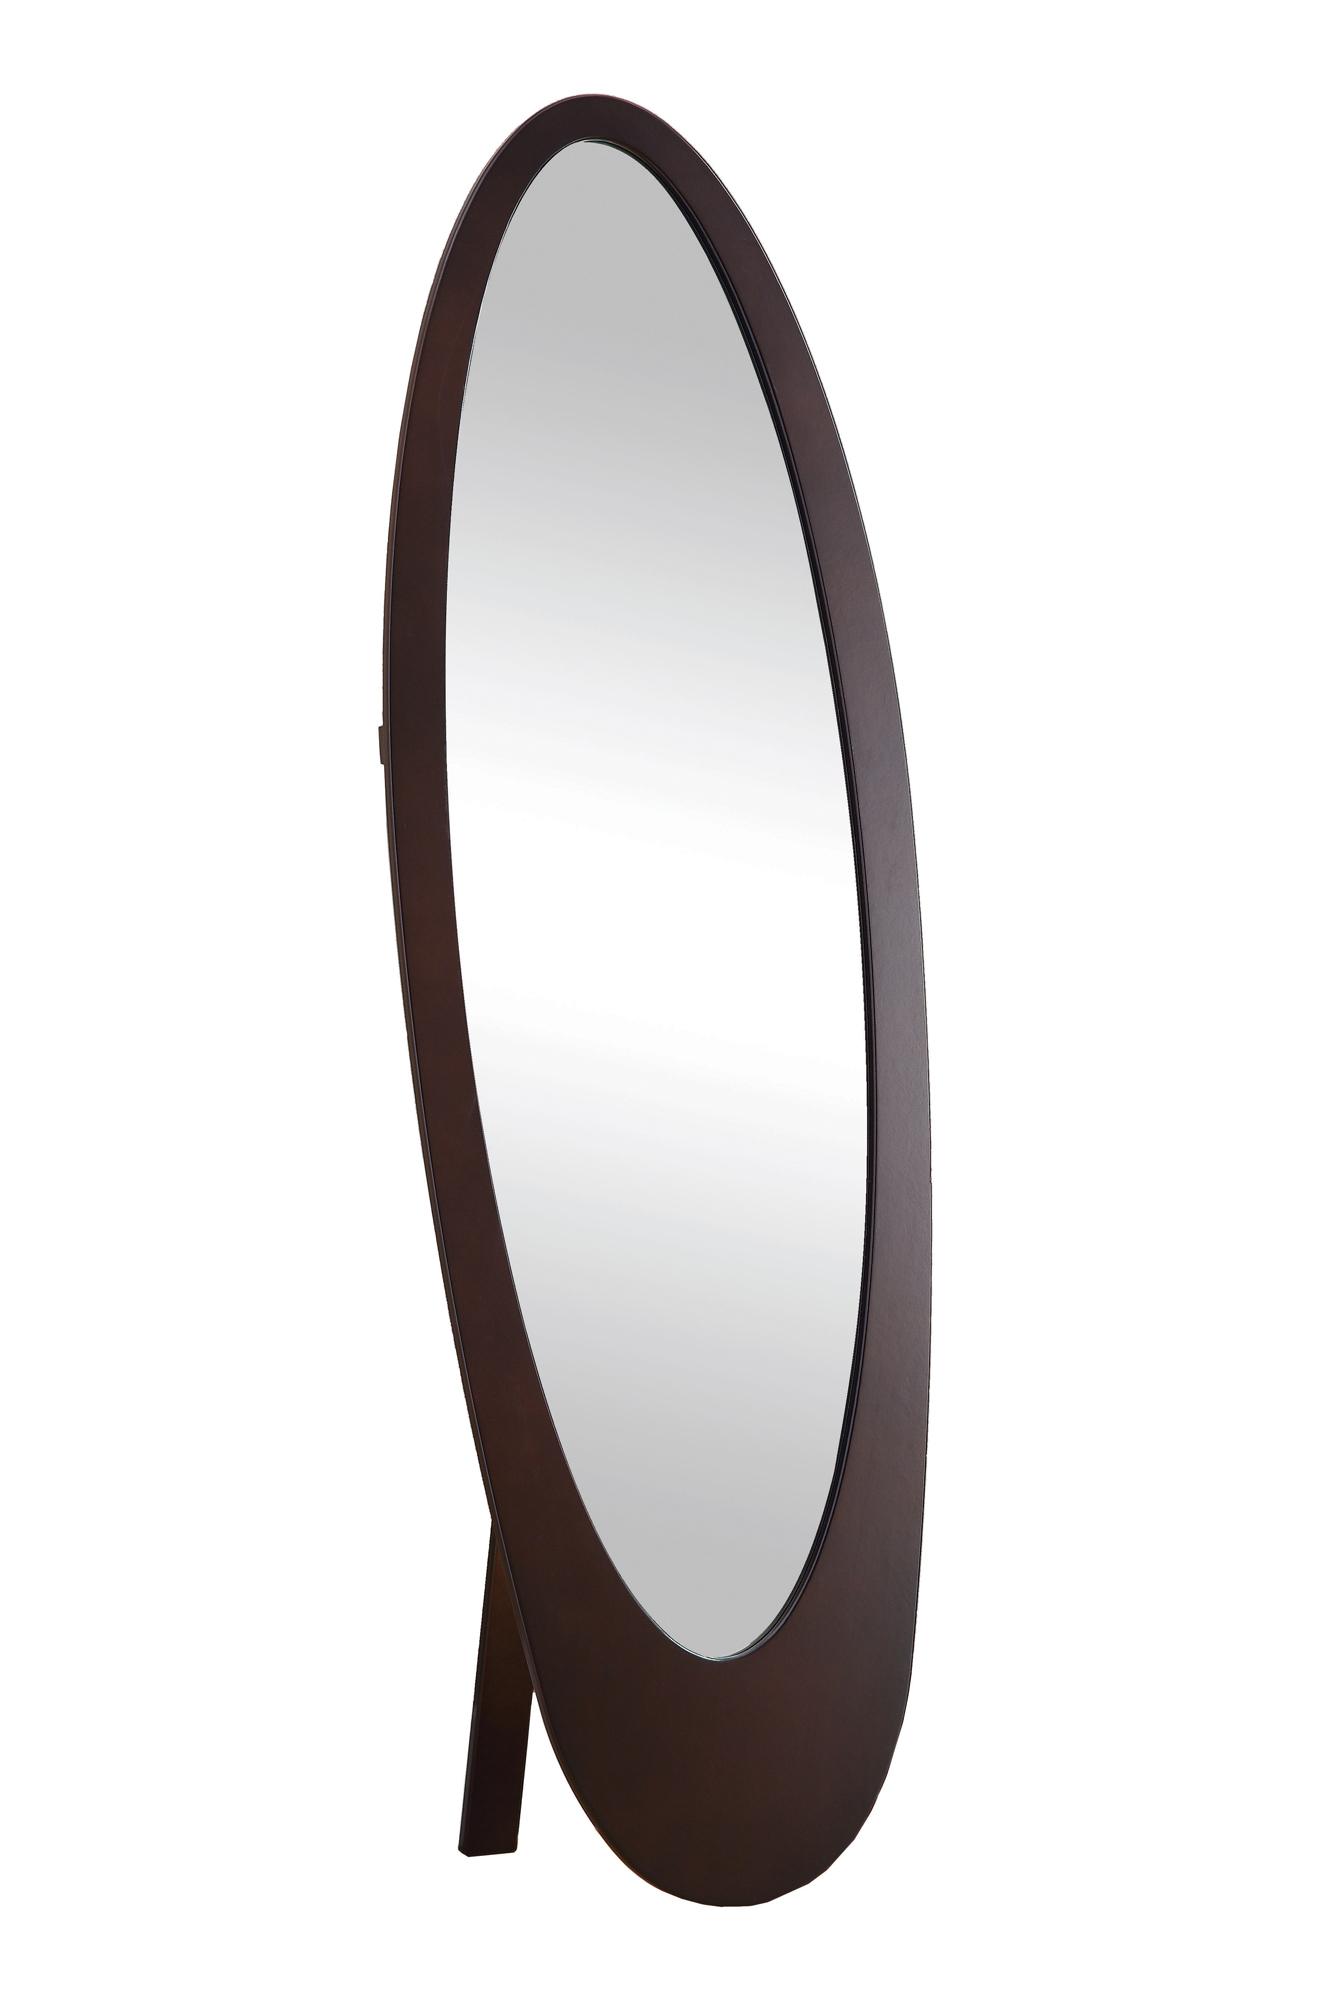 "59"" Contemporary Oval Shaped Cheval Mirror, Cappuccino"